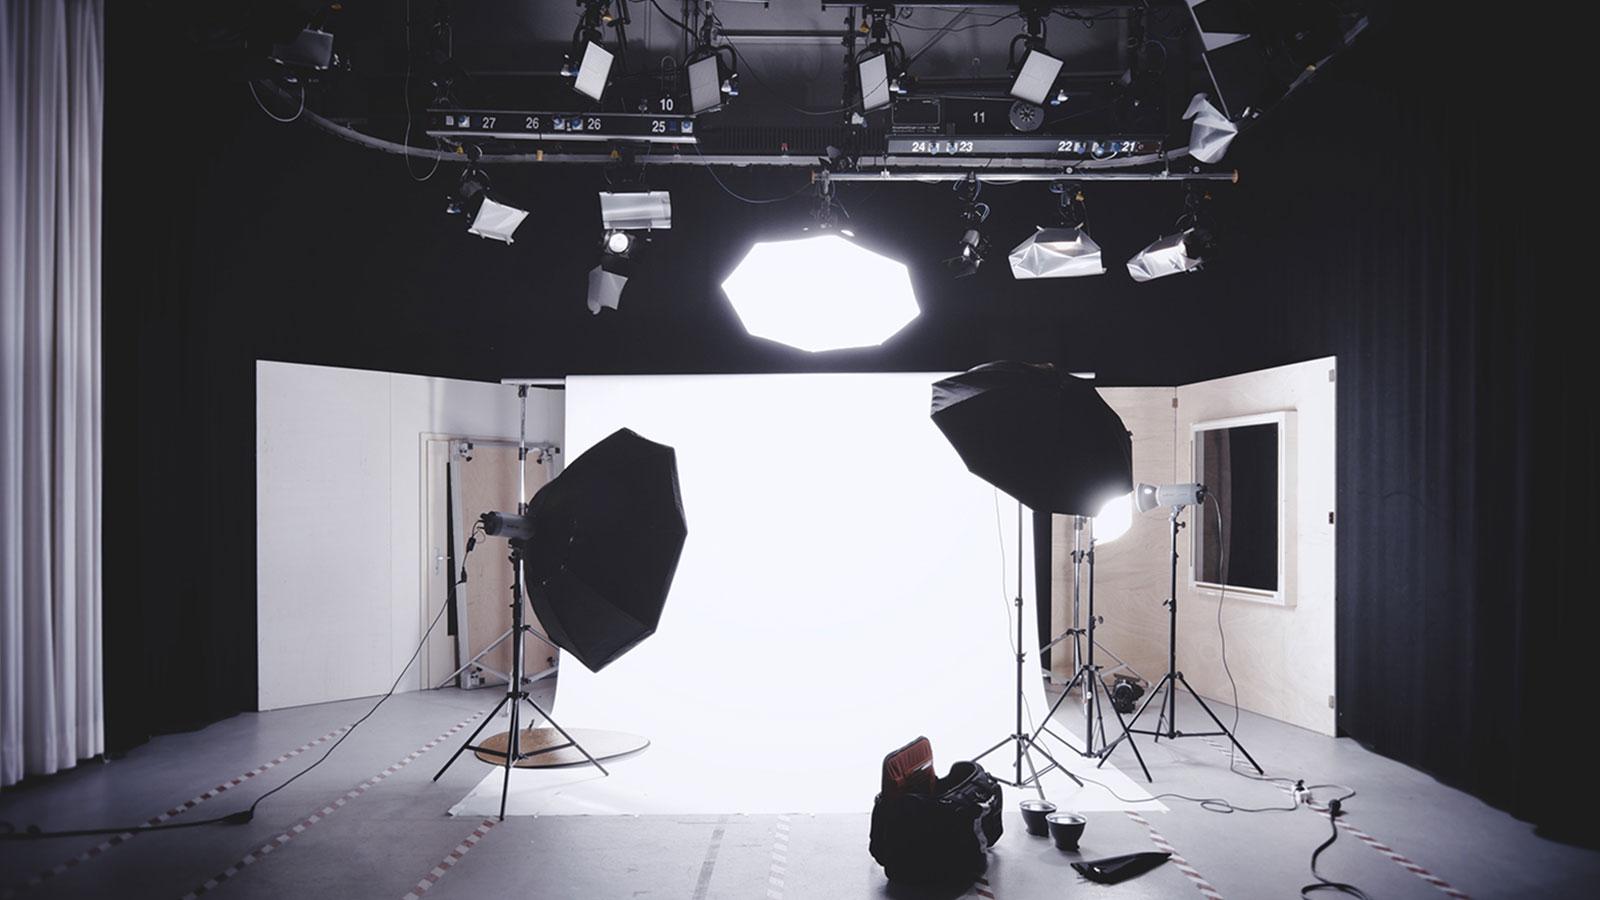 Viji's Photography Studio